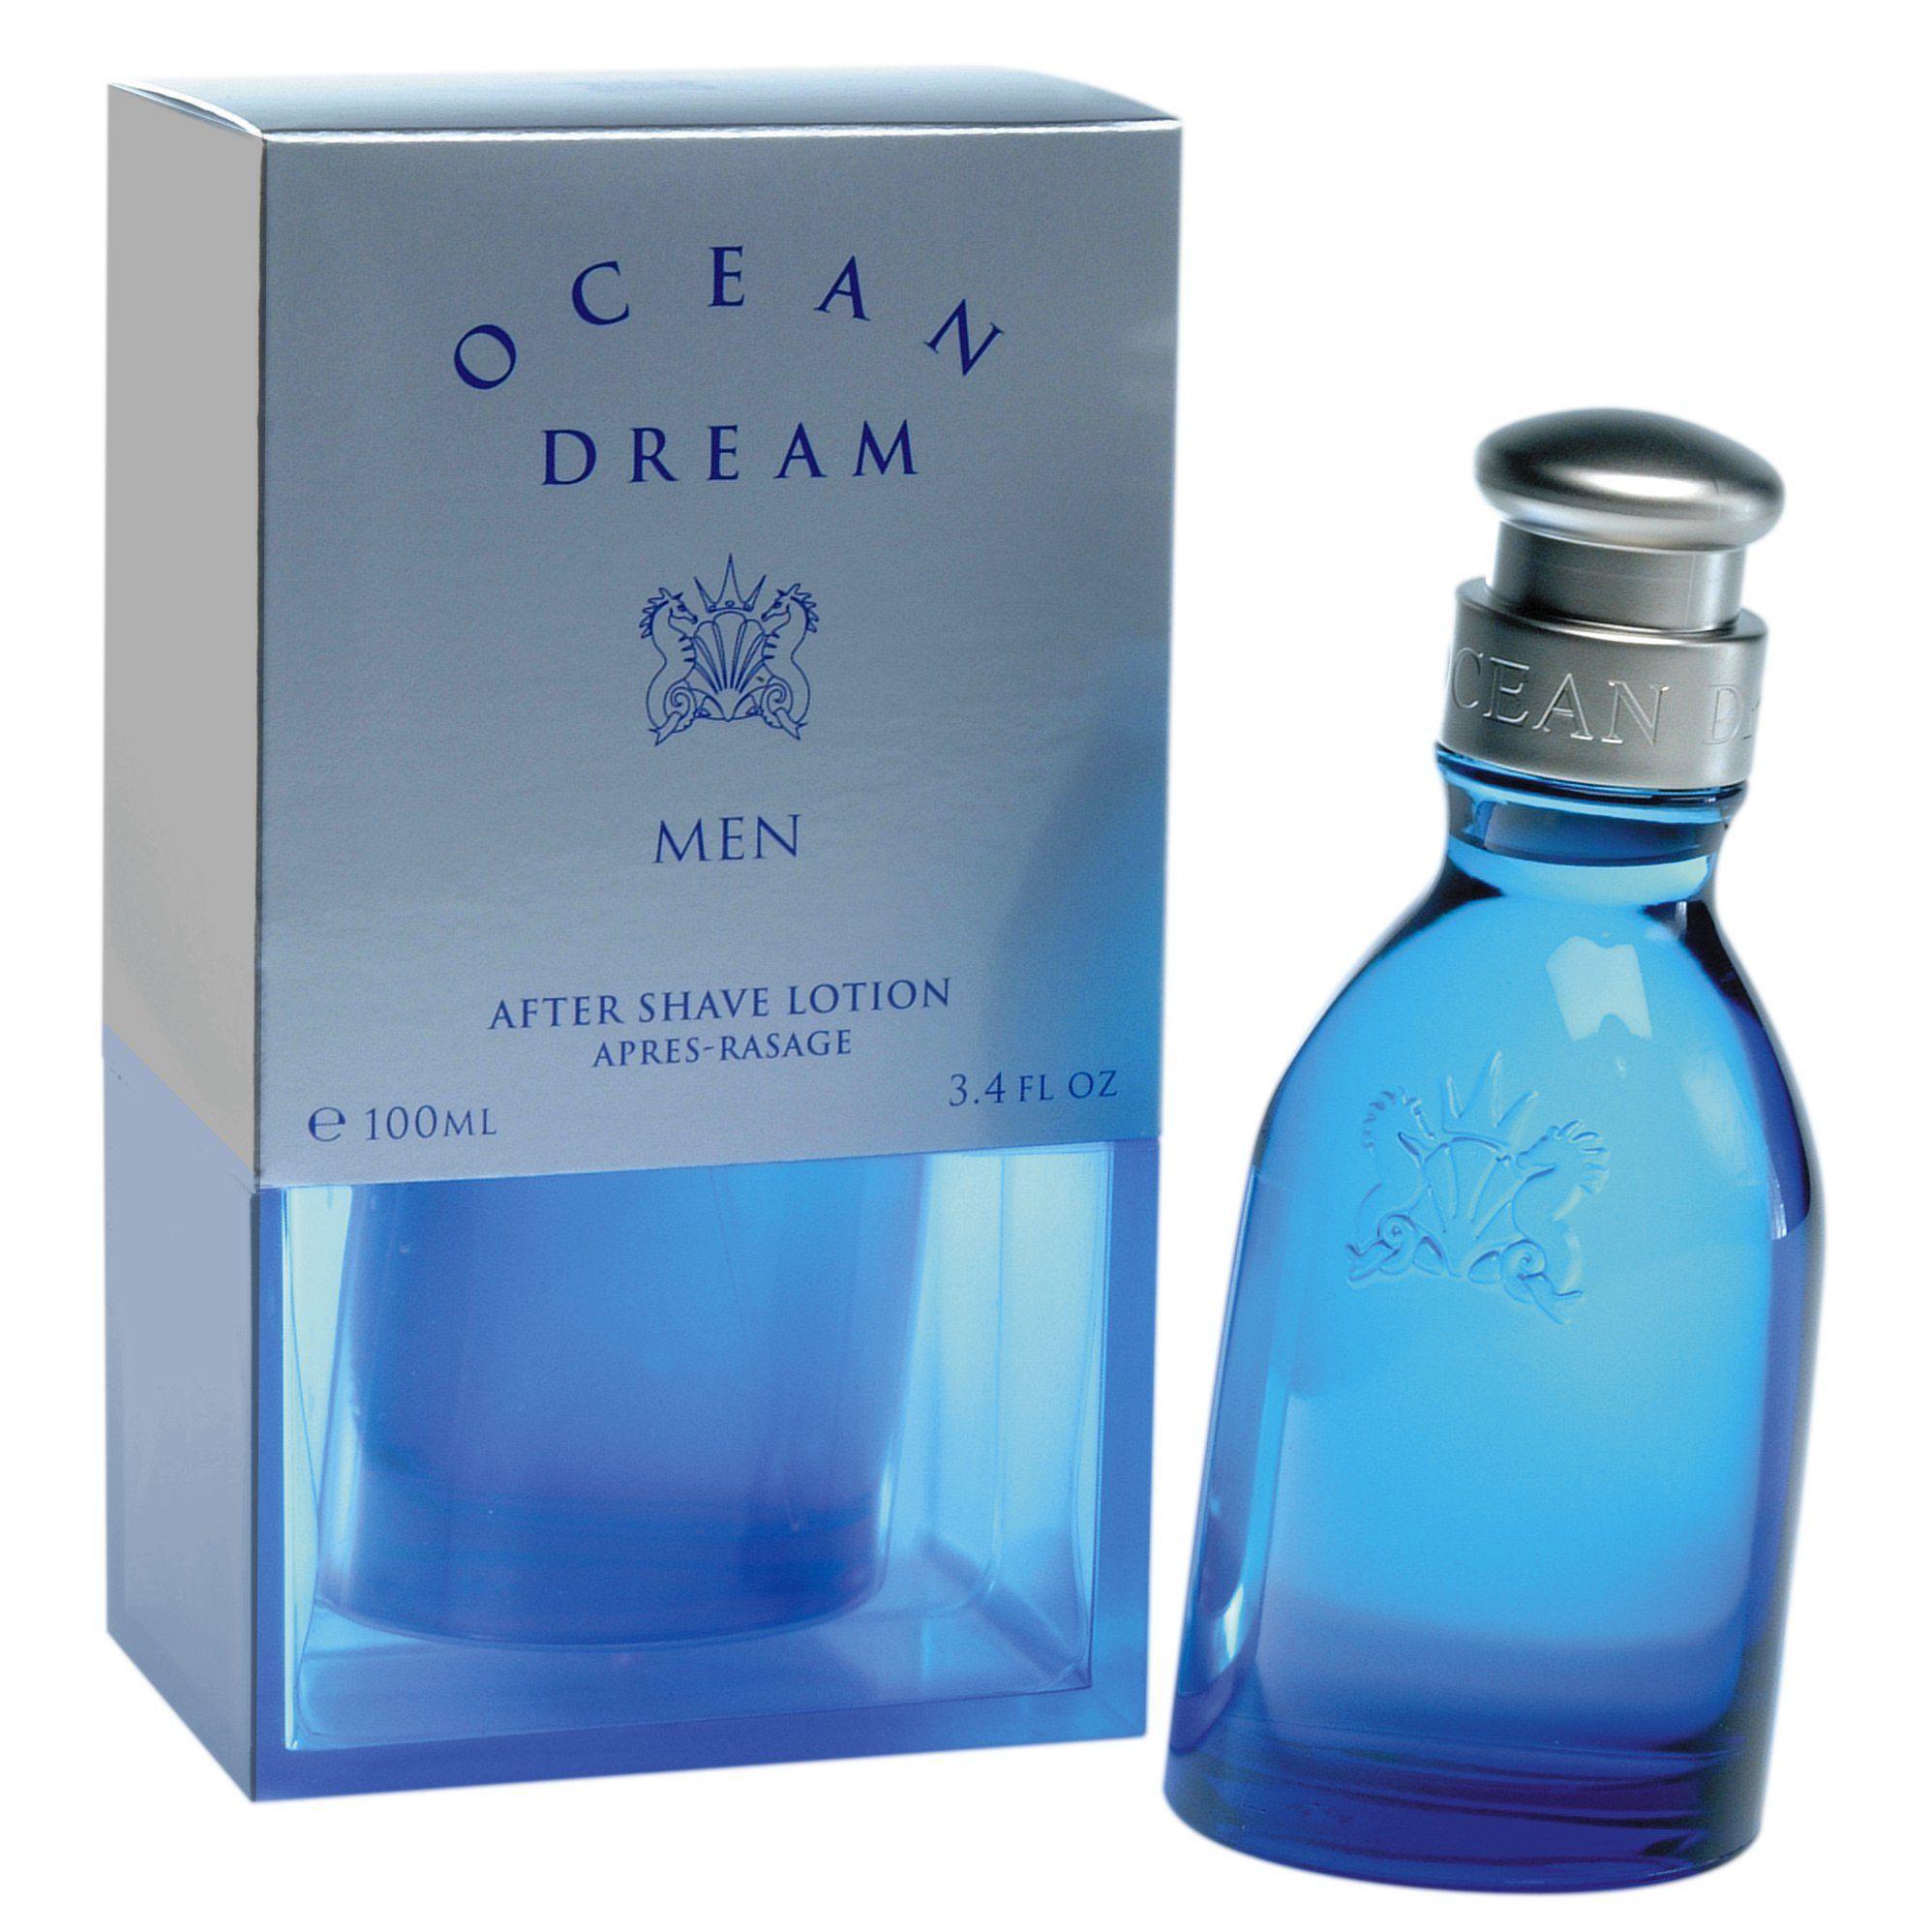 Giorgio Beverly Hills Ocean Dream Men Dopobarba 100 ml Splash